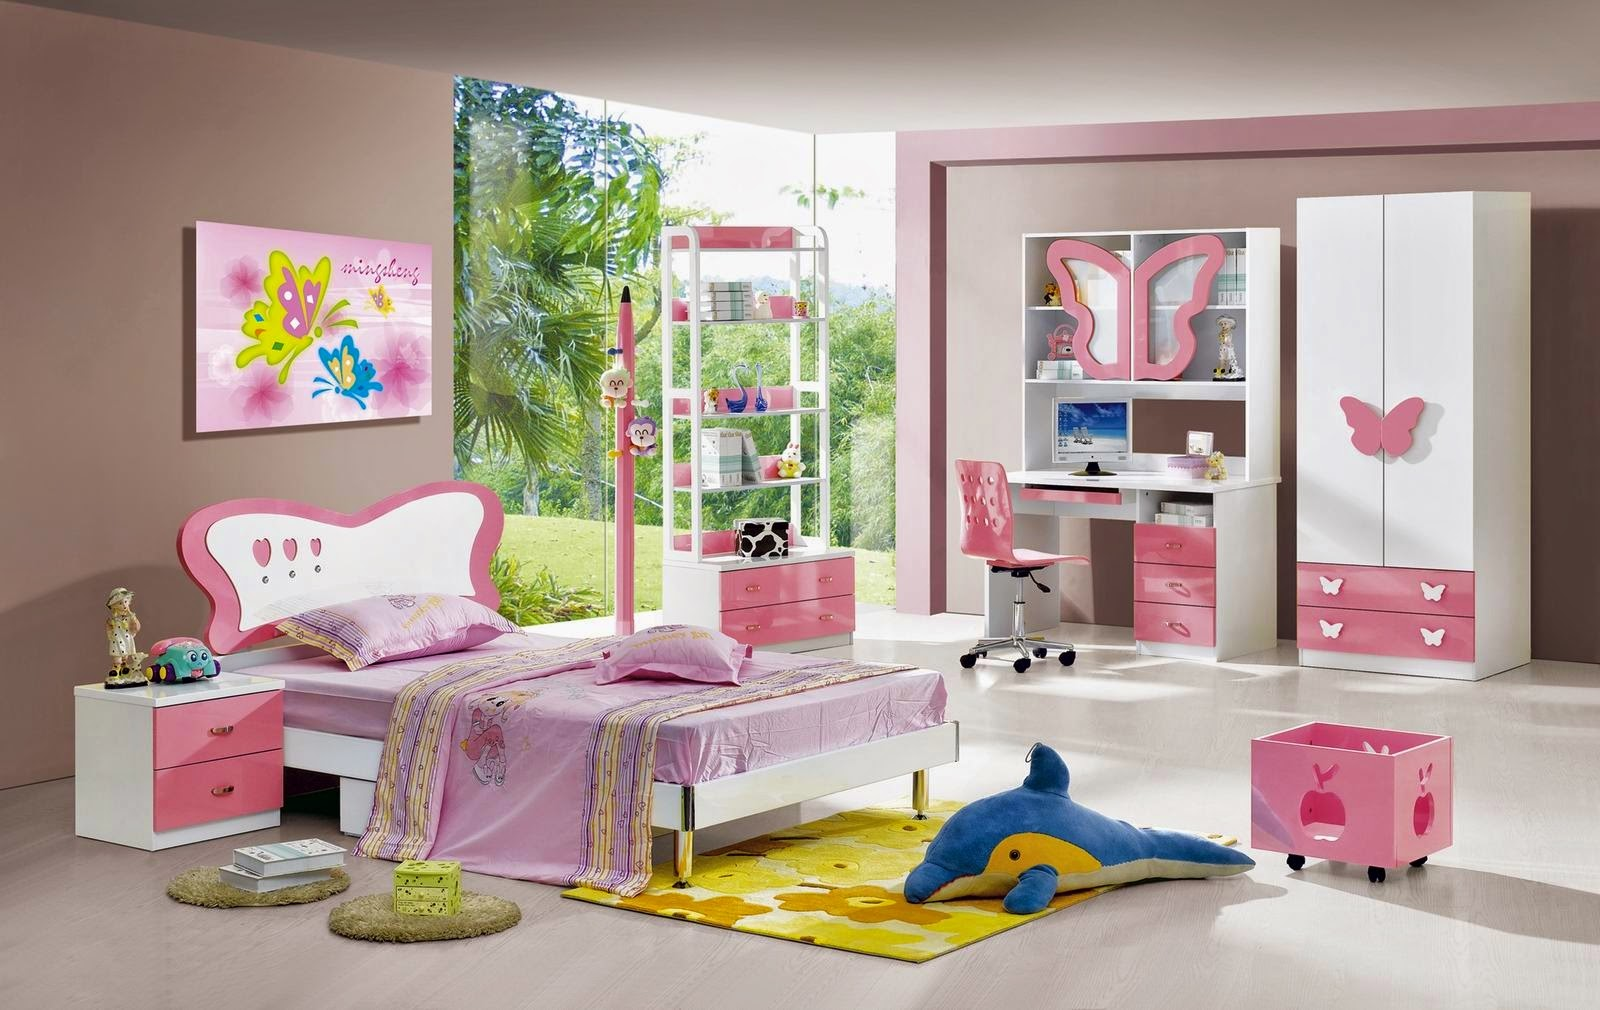 44 inspiring ideas for the design of children's rooms HMHXCOM